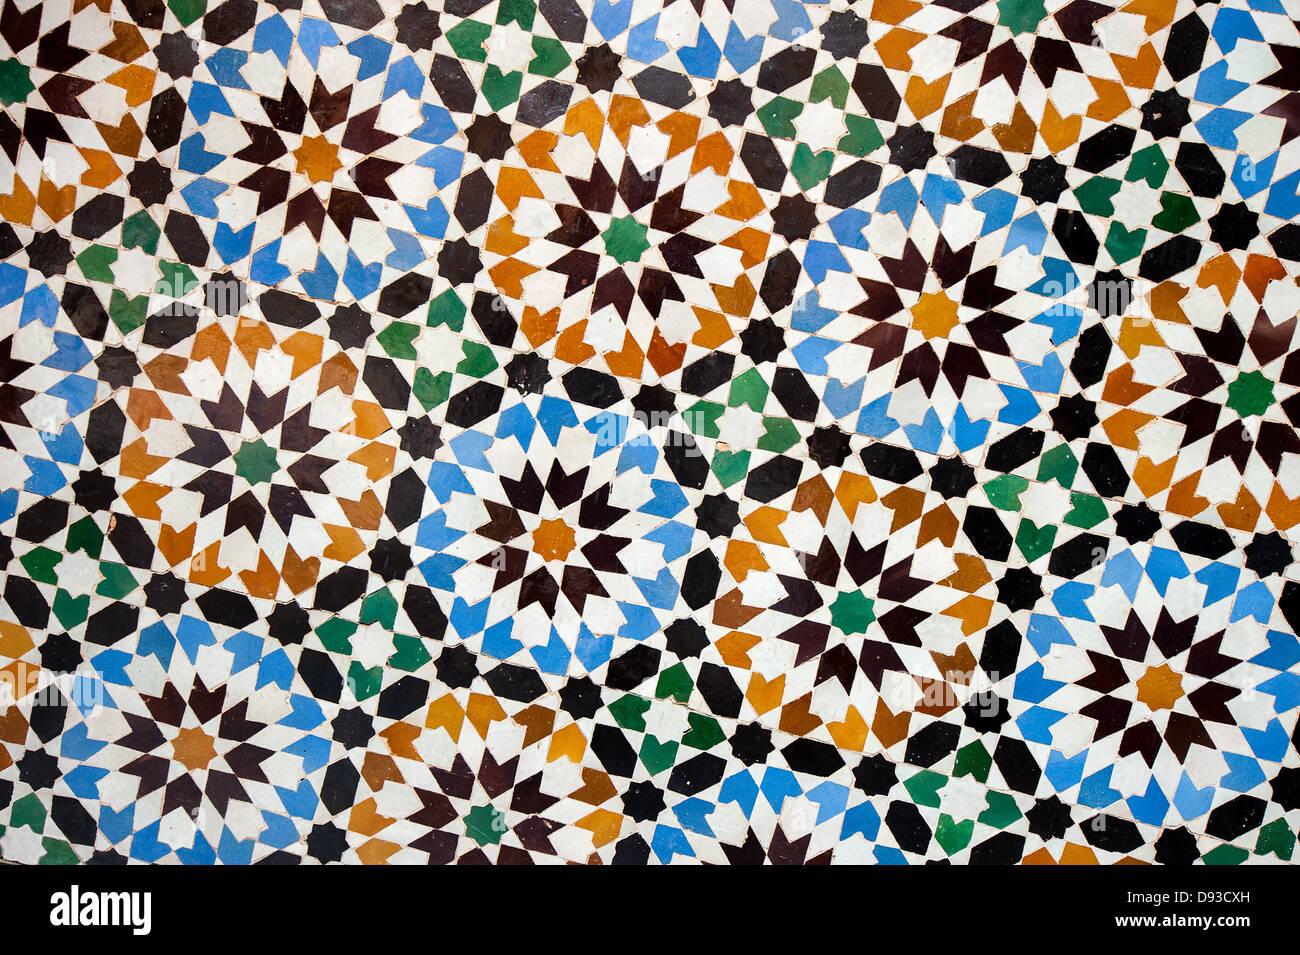 Moroccan pattern immagini & moroccan pattern fotos stock alamy